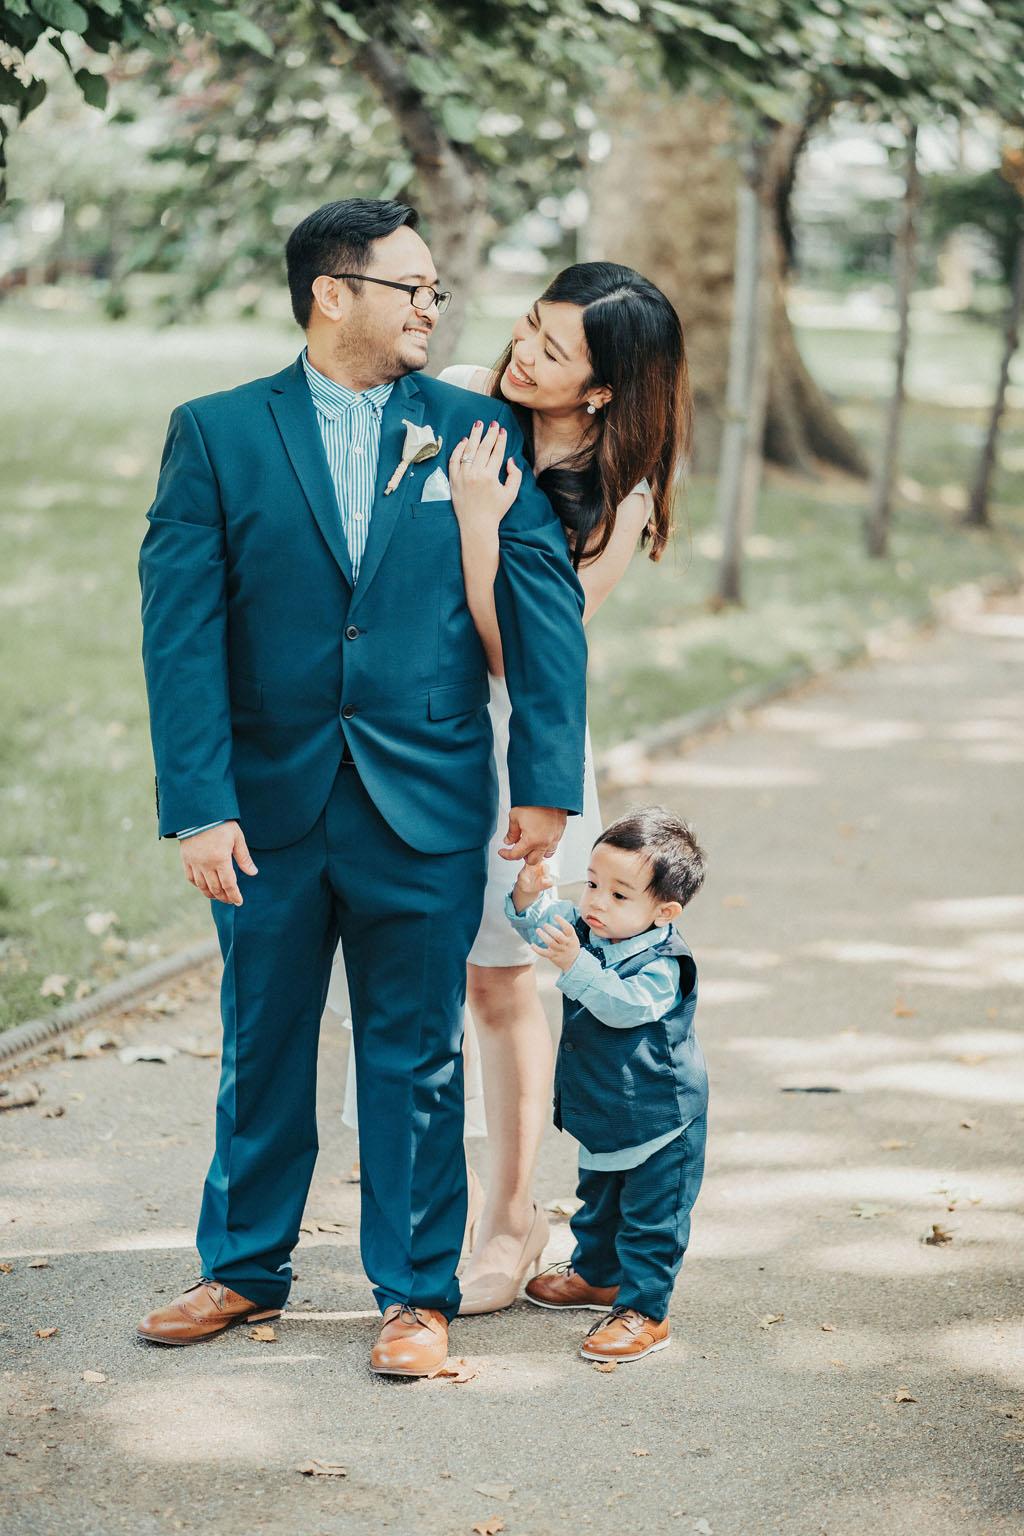 London rooftop micro wedding, Roanne wears a knee length white dress with asymmetrical skirt, Rey wears a blue suit